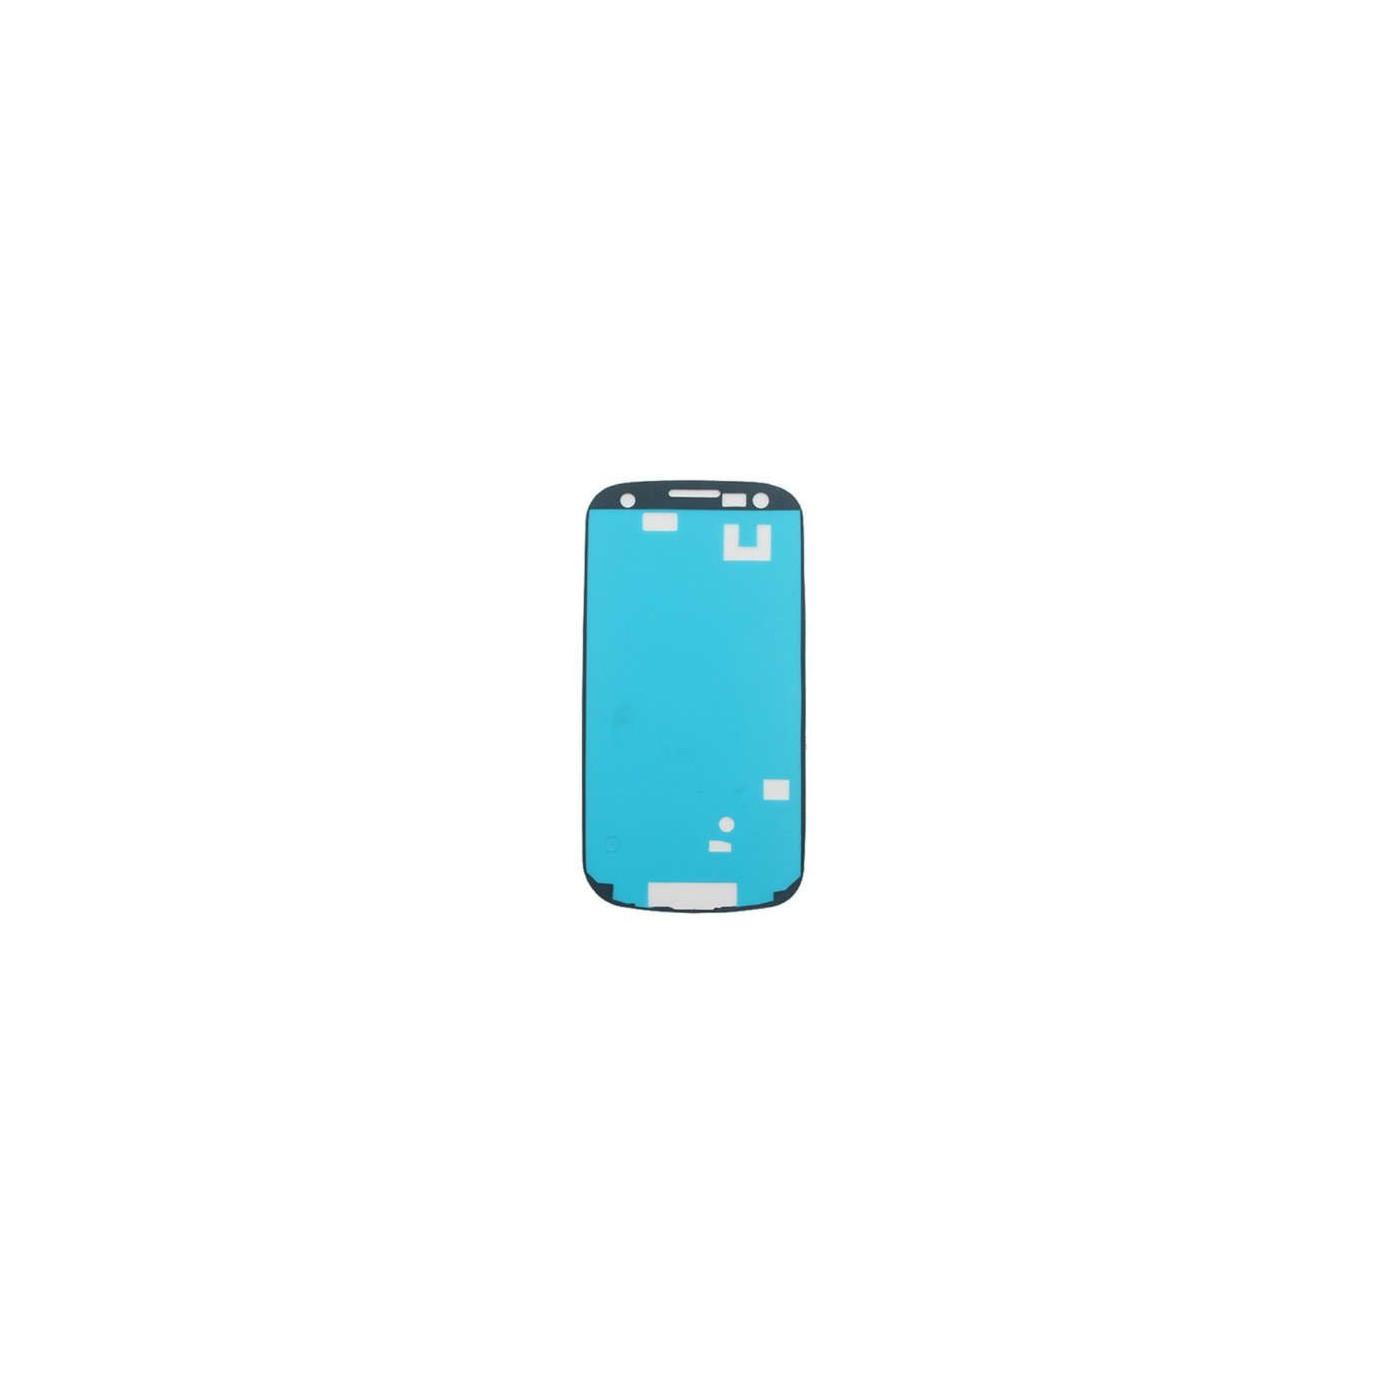 Vidrio adhesivo de doble cara para Samsung Galaxy S4 mini i9195 pantalla táctil de la etiqueta engomada